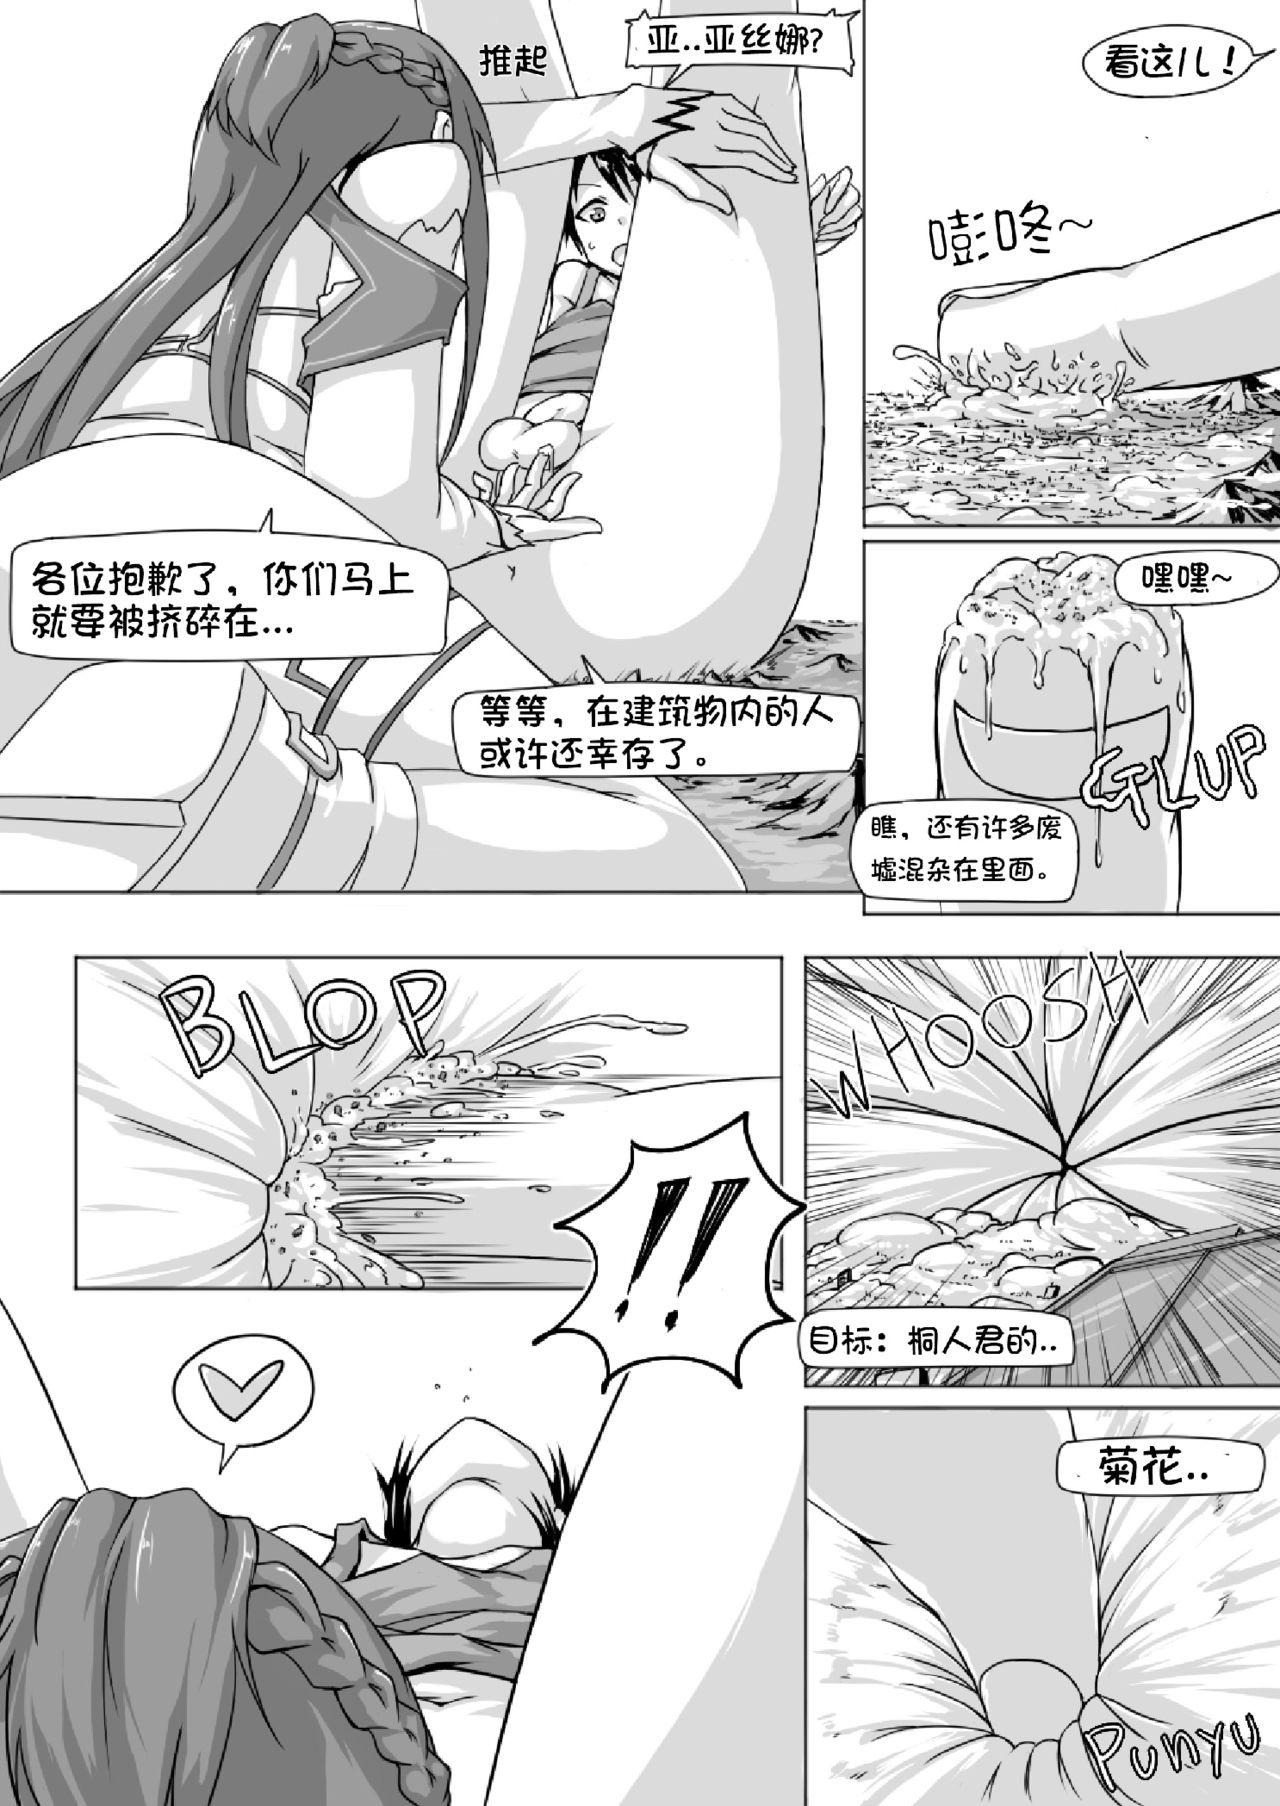 Size Henkou de Asuna ga Yaritai Houdai Online | 体型变化任性的亚丝娜网络游戏 6